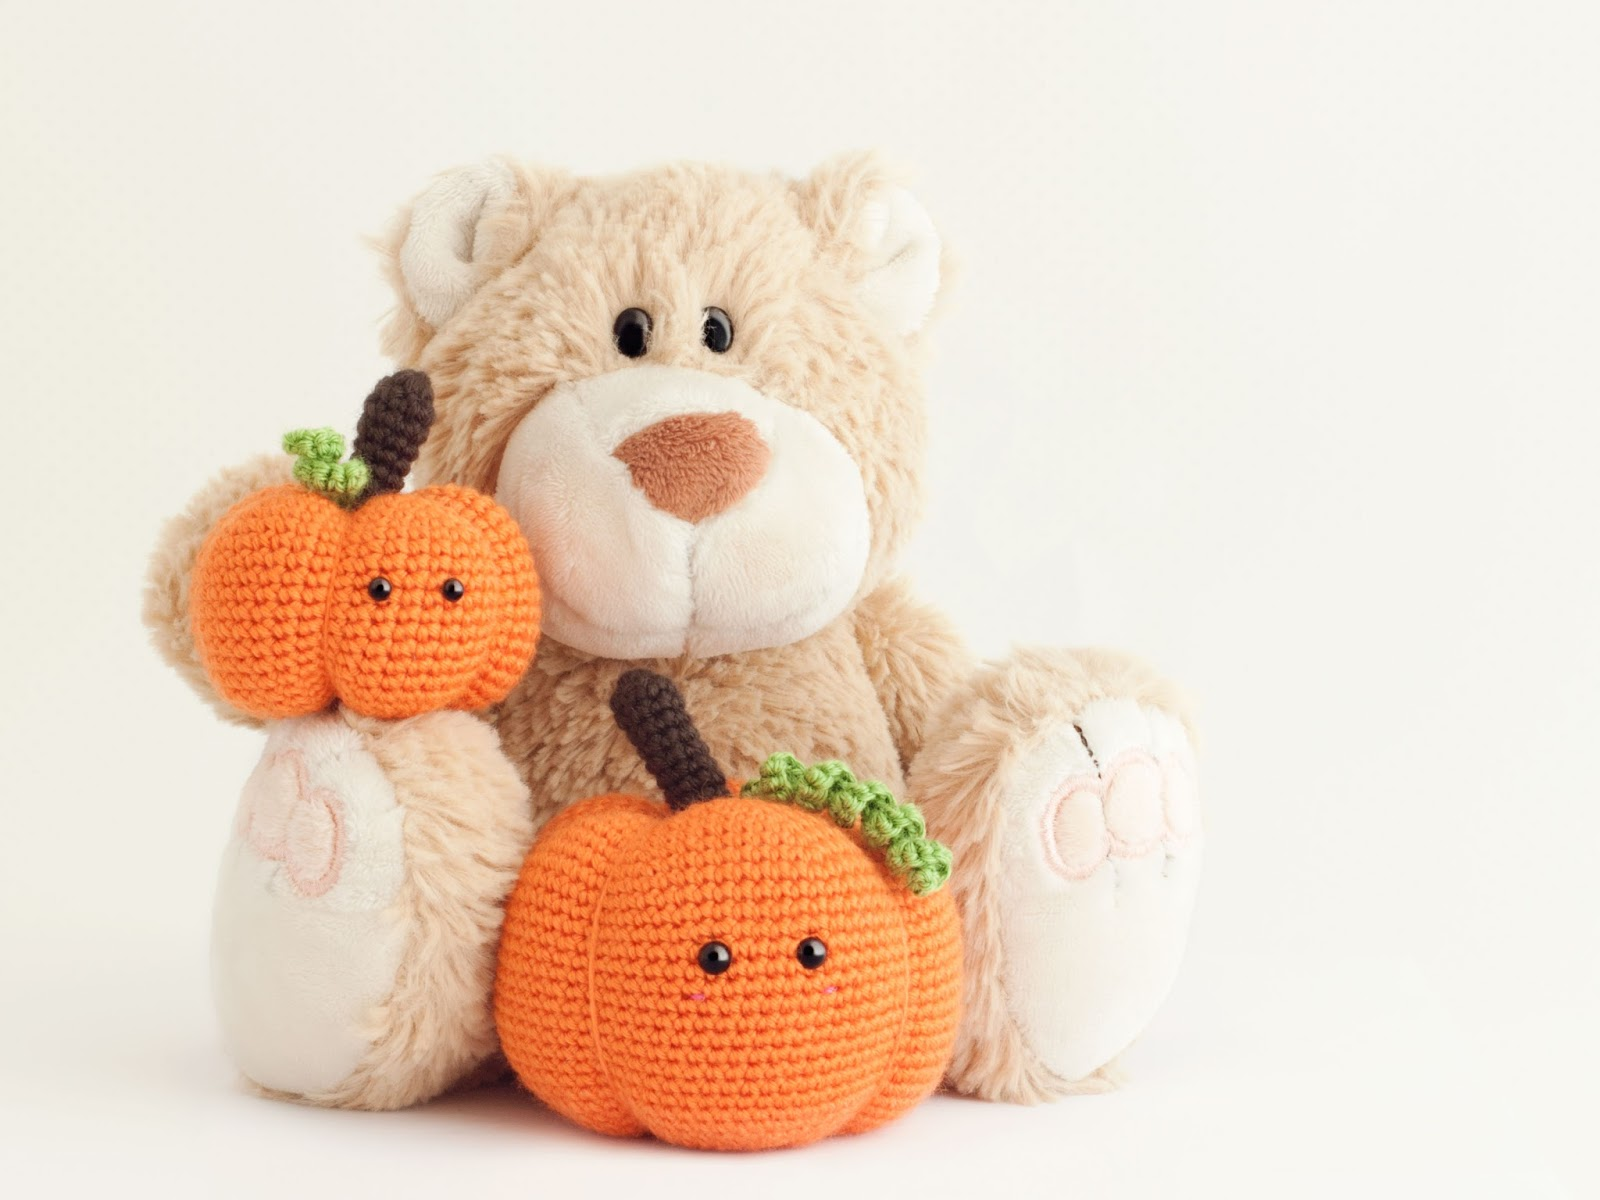 Arte Friki: 10 Patrones de Amigurumis Gratis para Halloween | 1200x1600